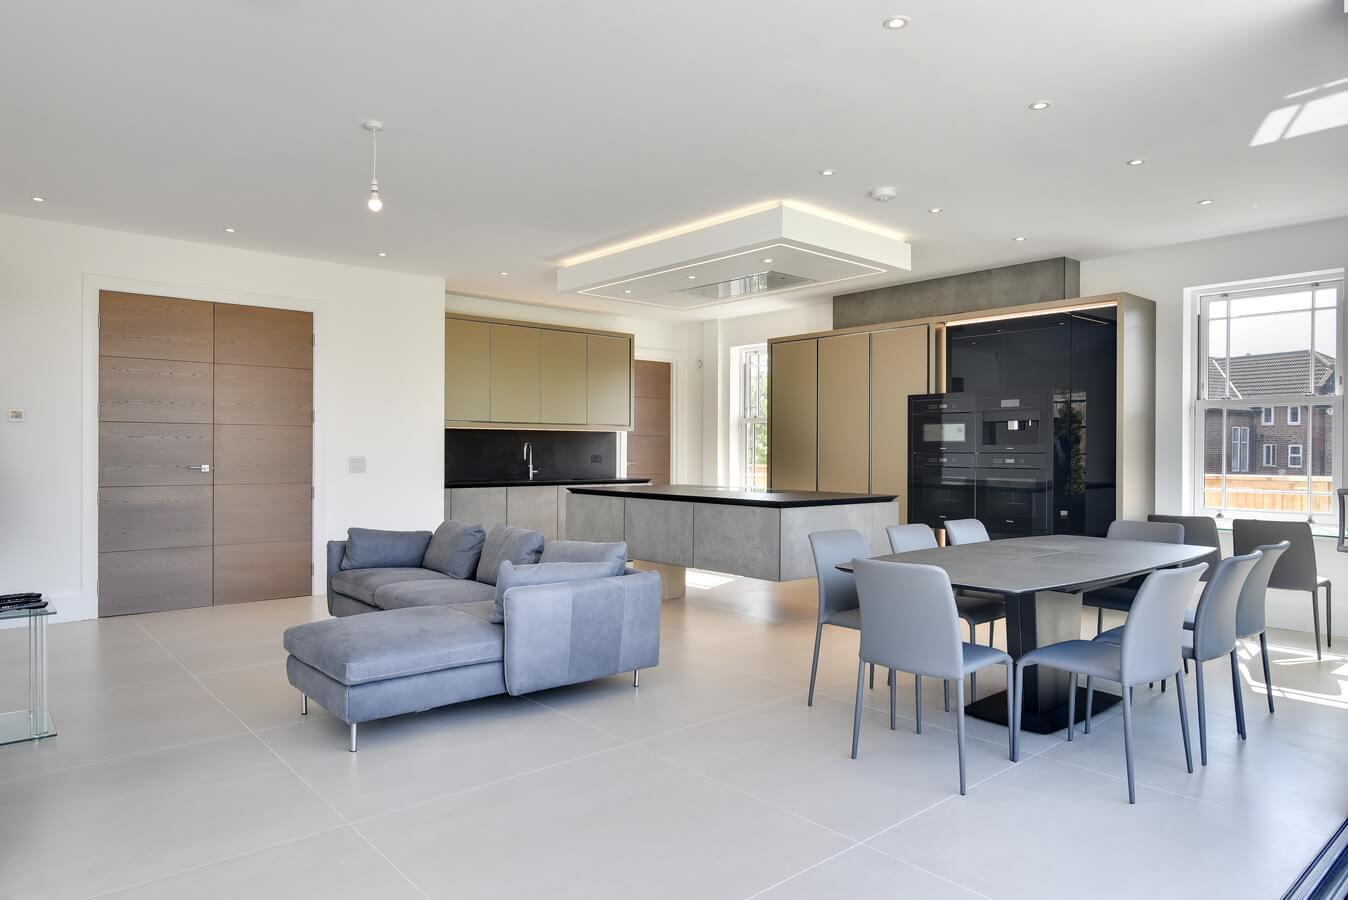 Finchely-London-German-Designed-Kitchen-Full-View.jpg